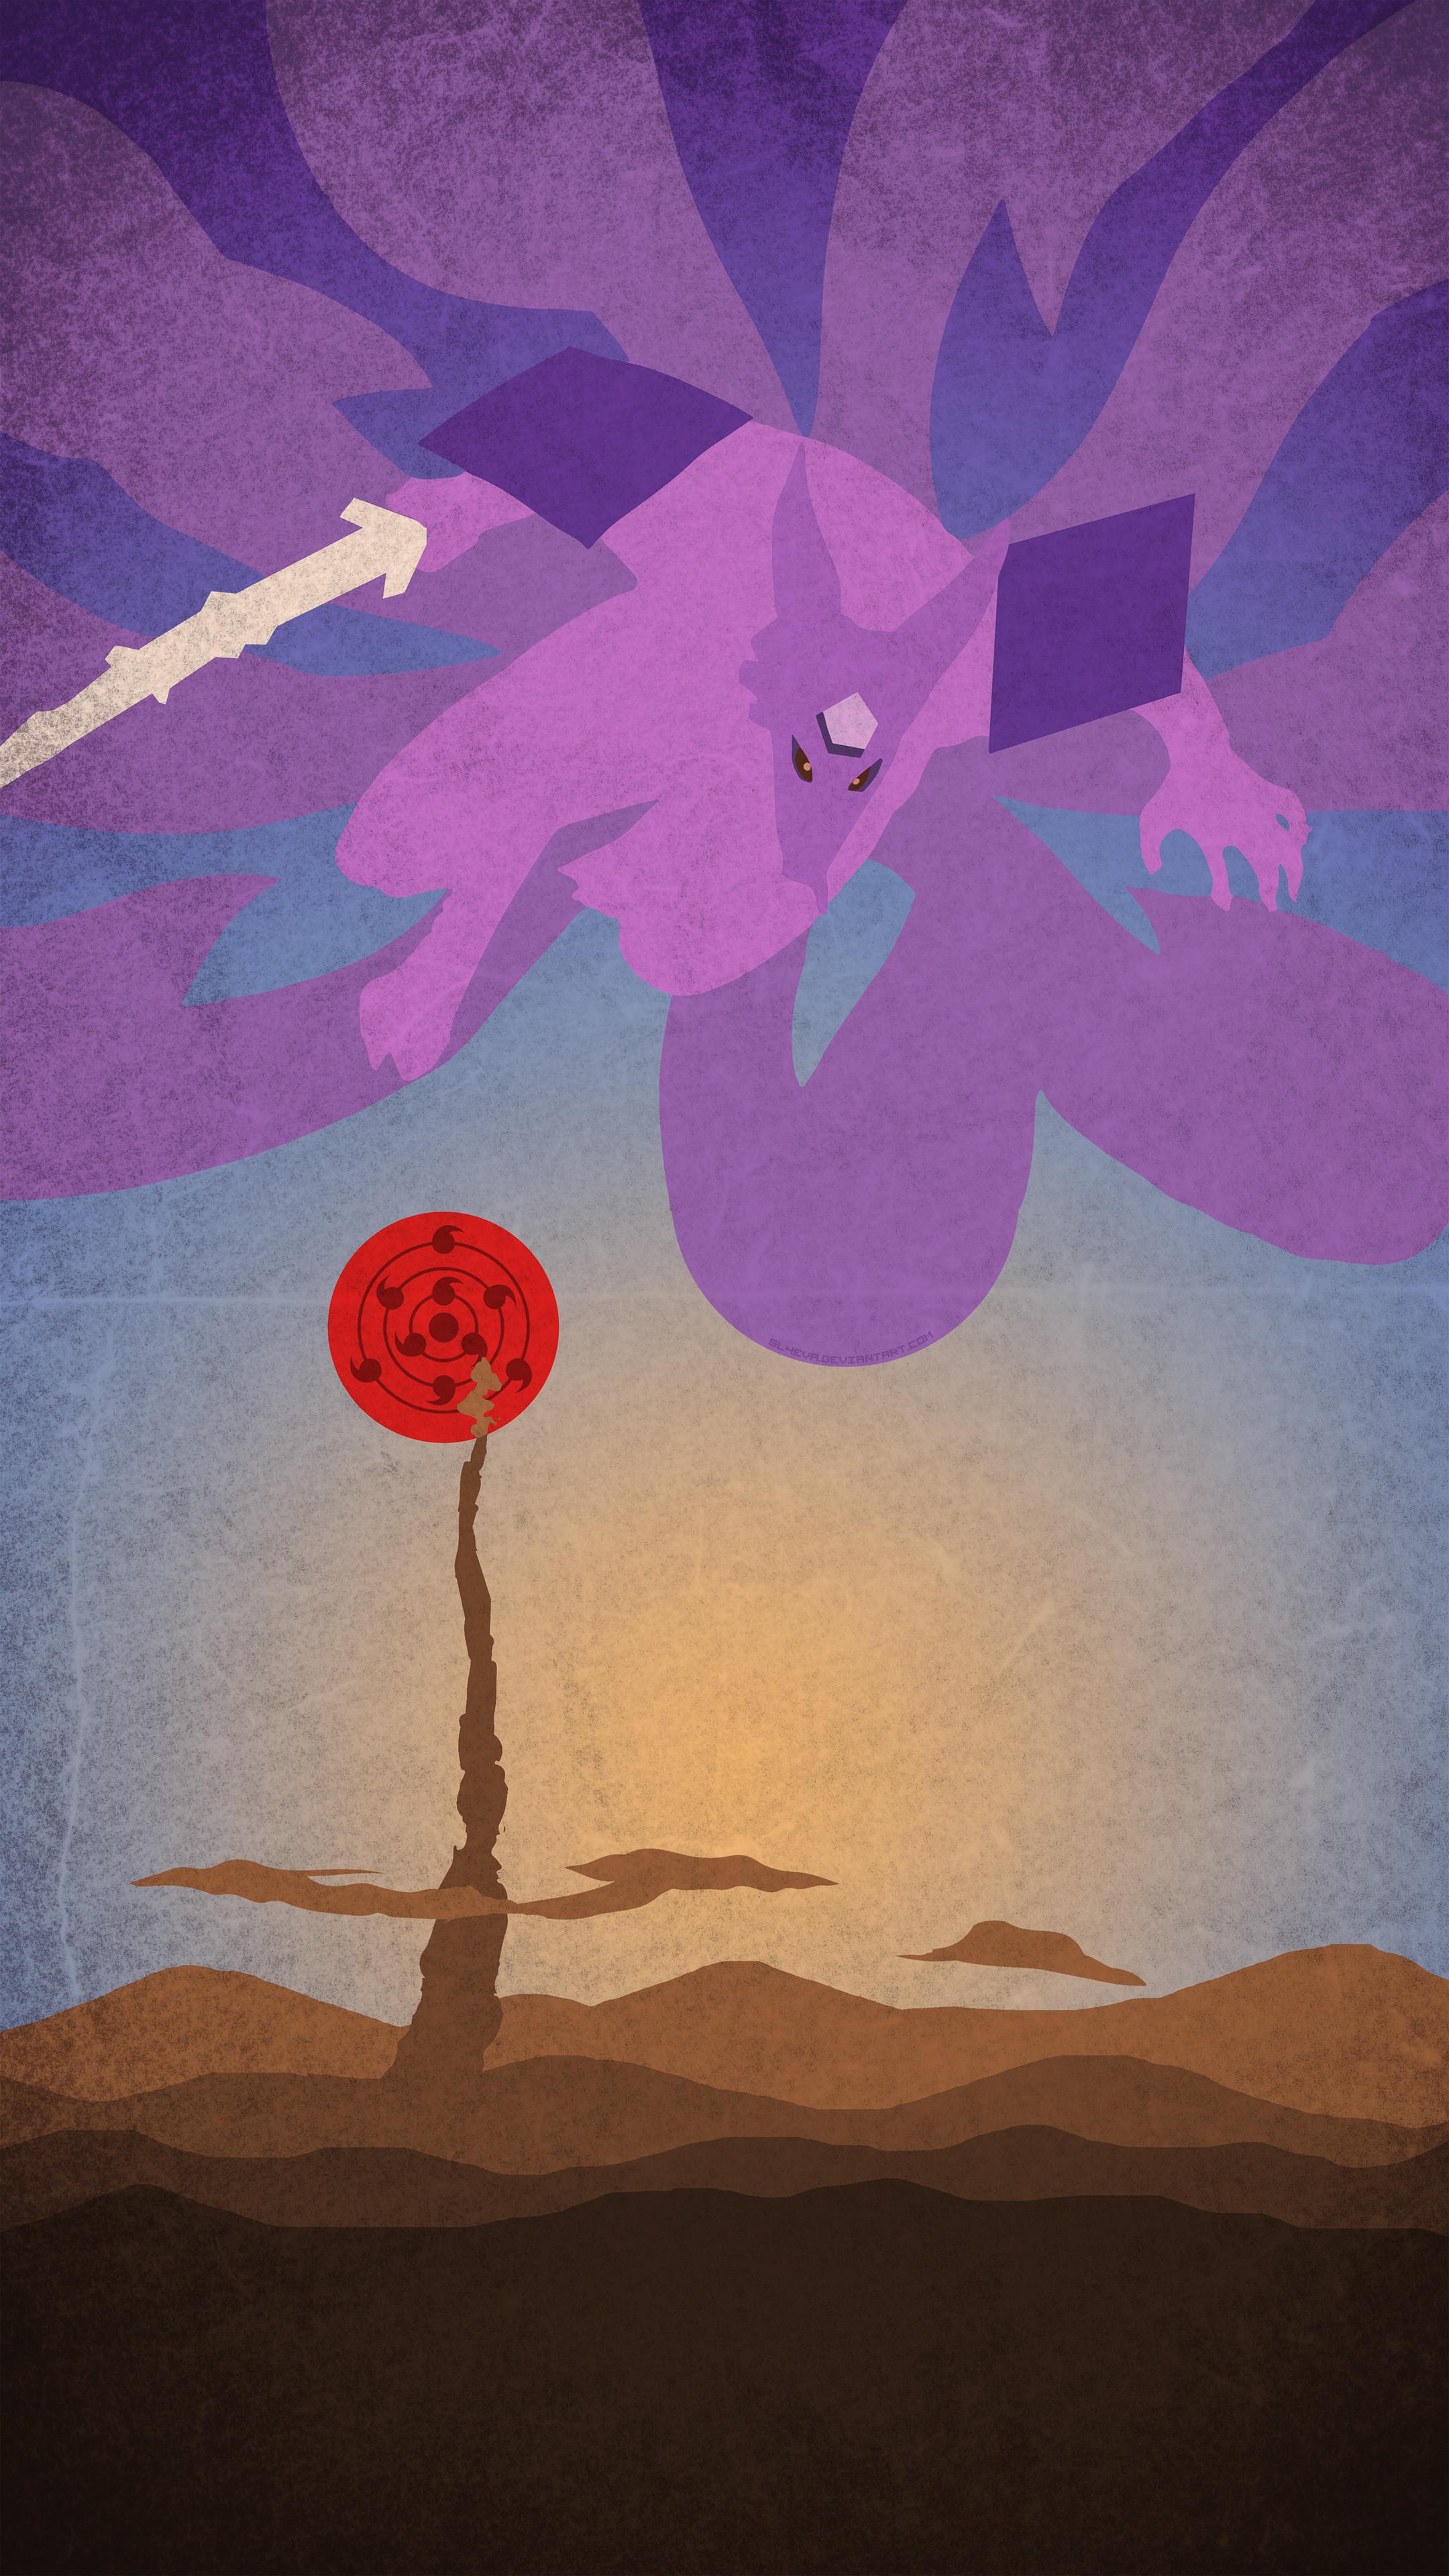 Cool Cute Backgrounds Iphone Hd Free Minimalist Naruto